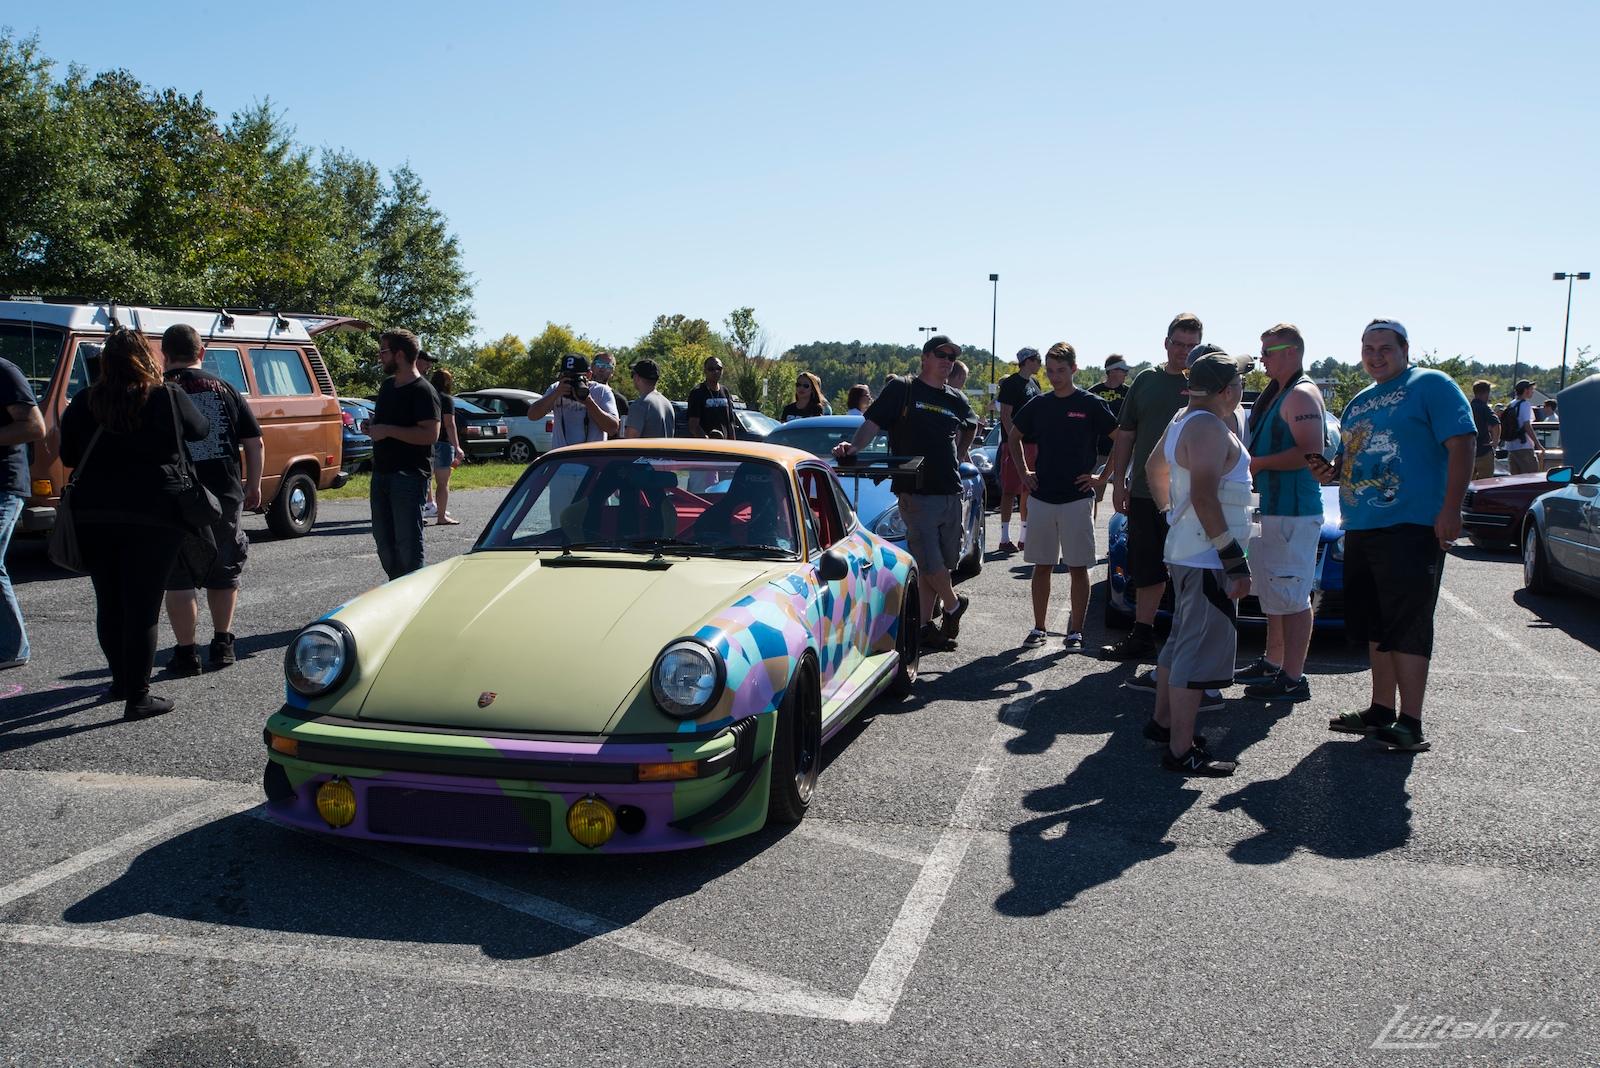 Lüfteknic #projectstuka Porsche 930 Turbo gathers onlookers at a car show